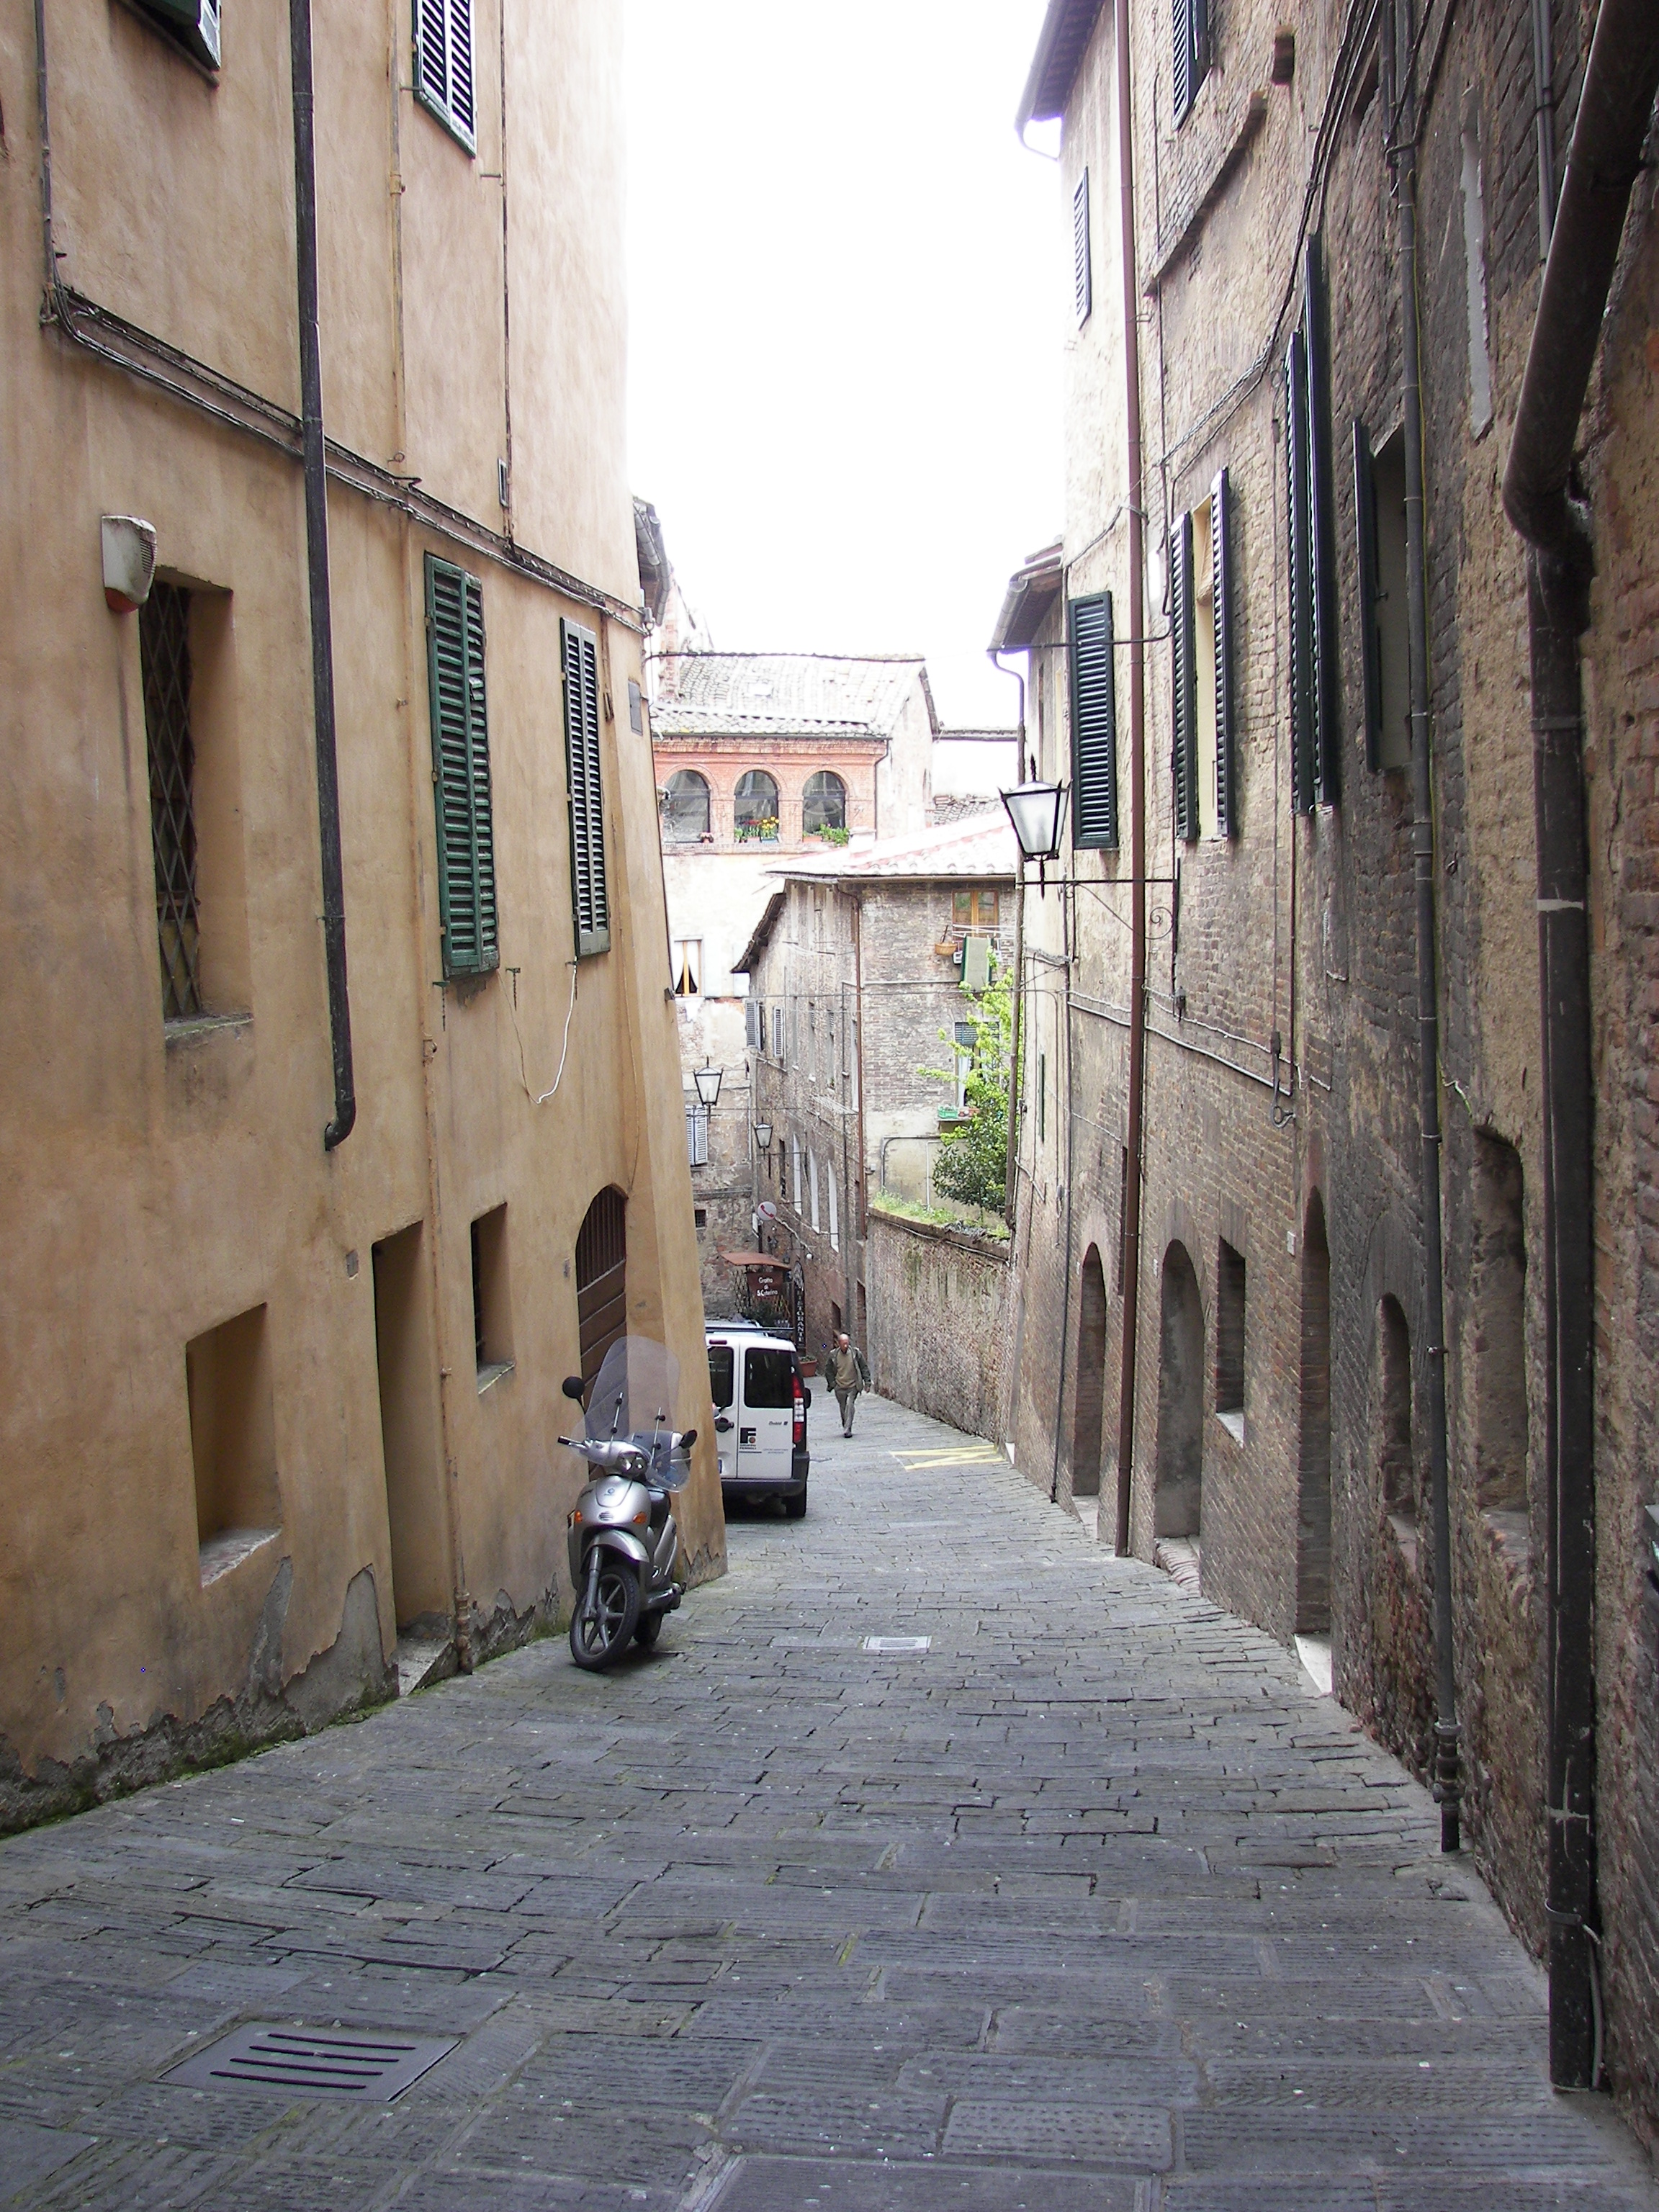 File:Siena streets 10 jpg - Wikimedia Commons